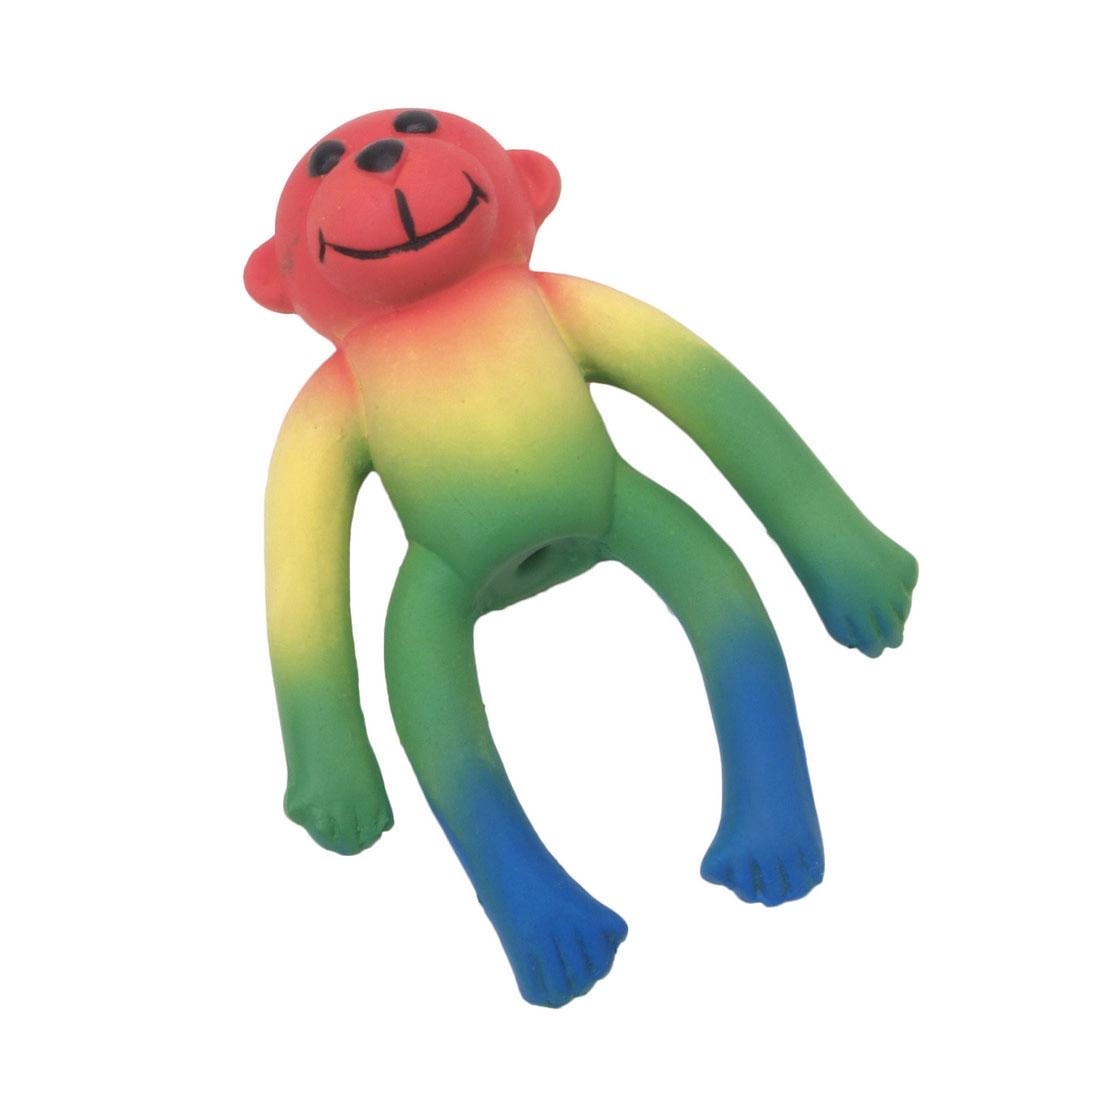 Coastal Pet Li'l Pals Latex Monkey Dog Toy, Multi-color, 4-in